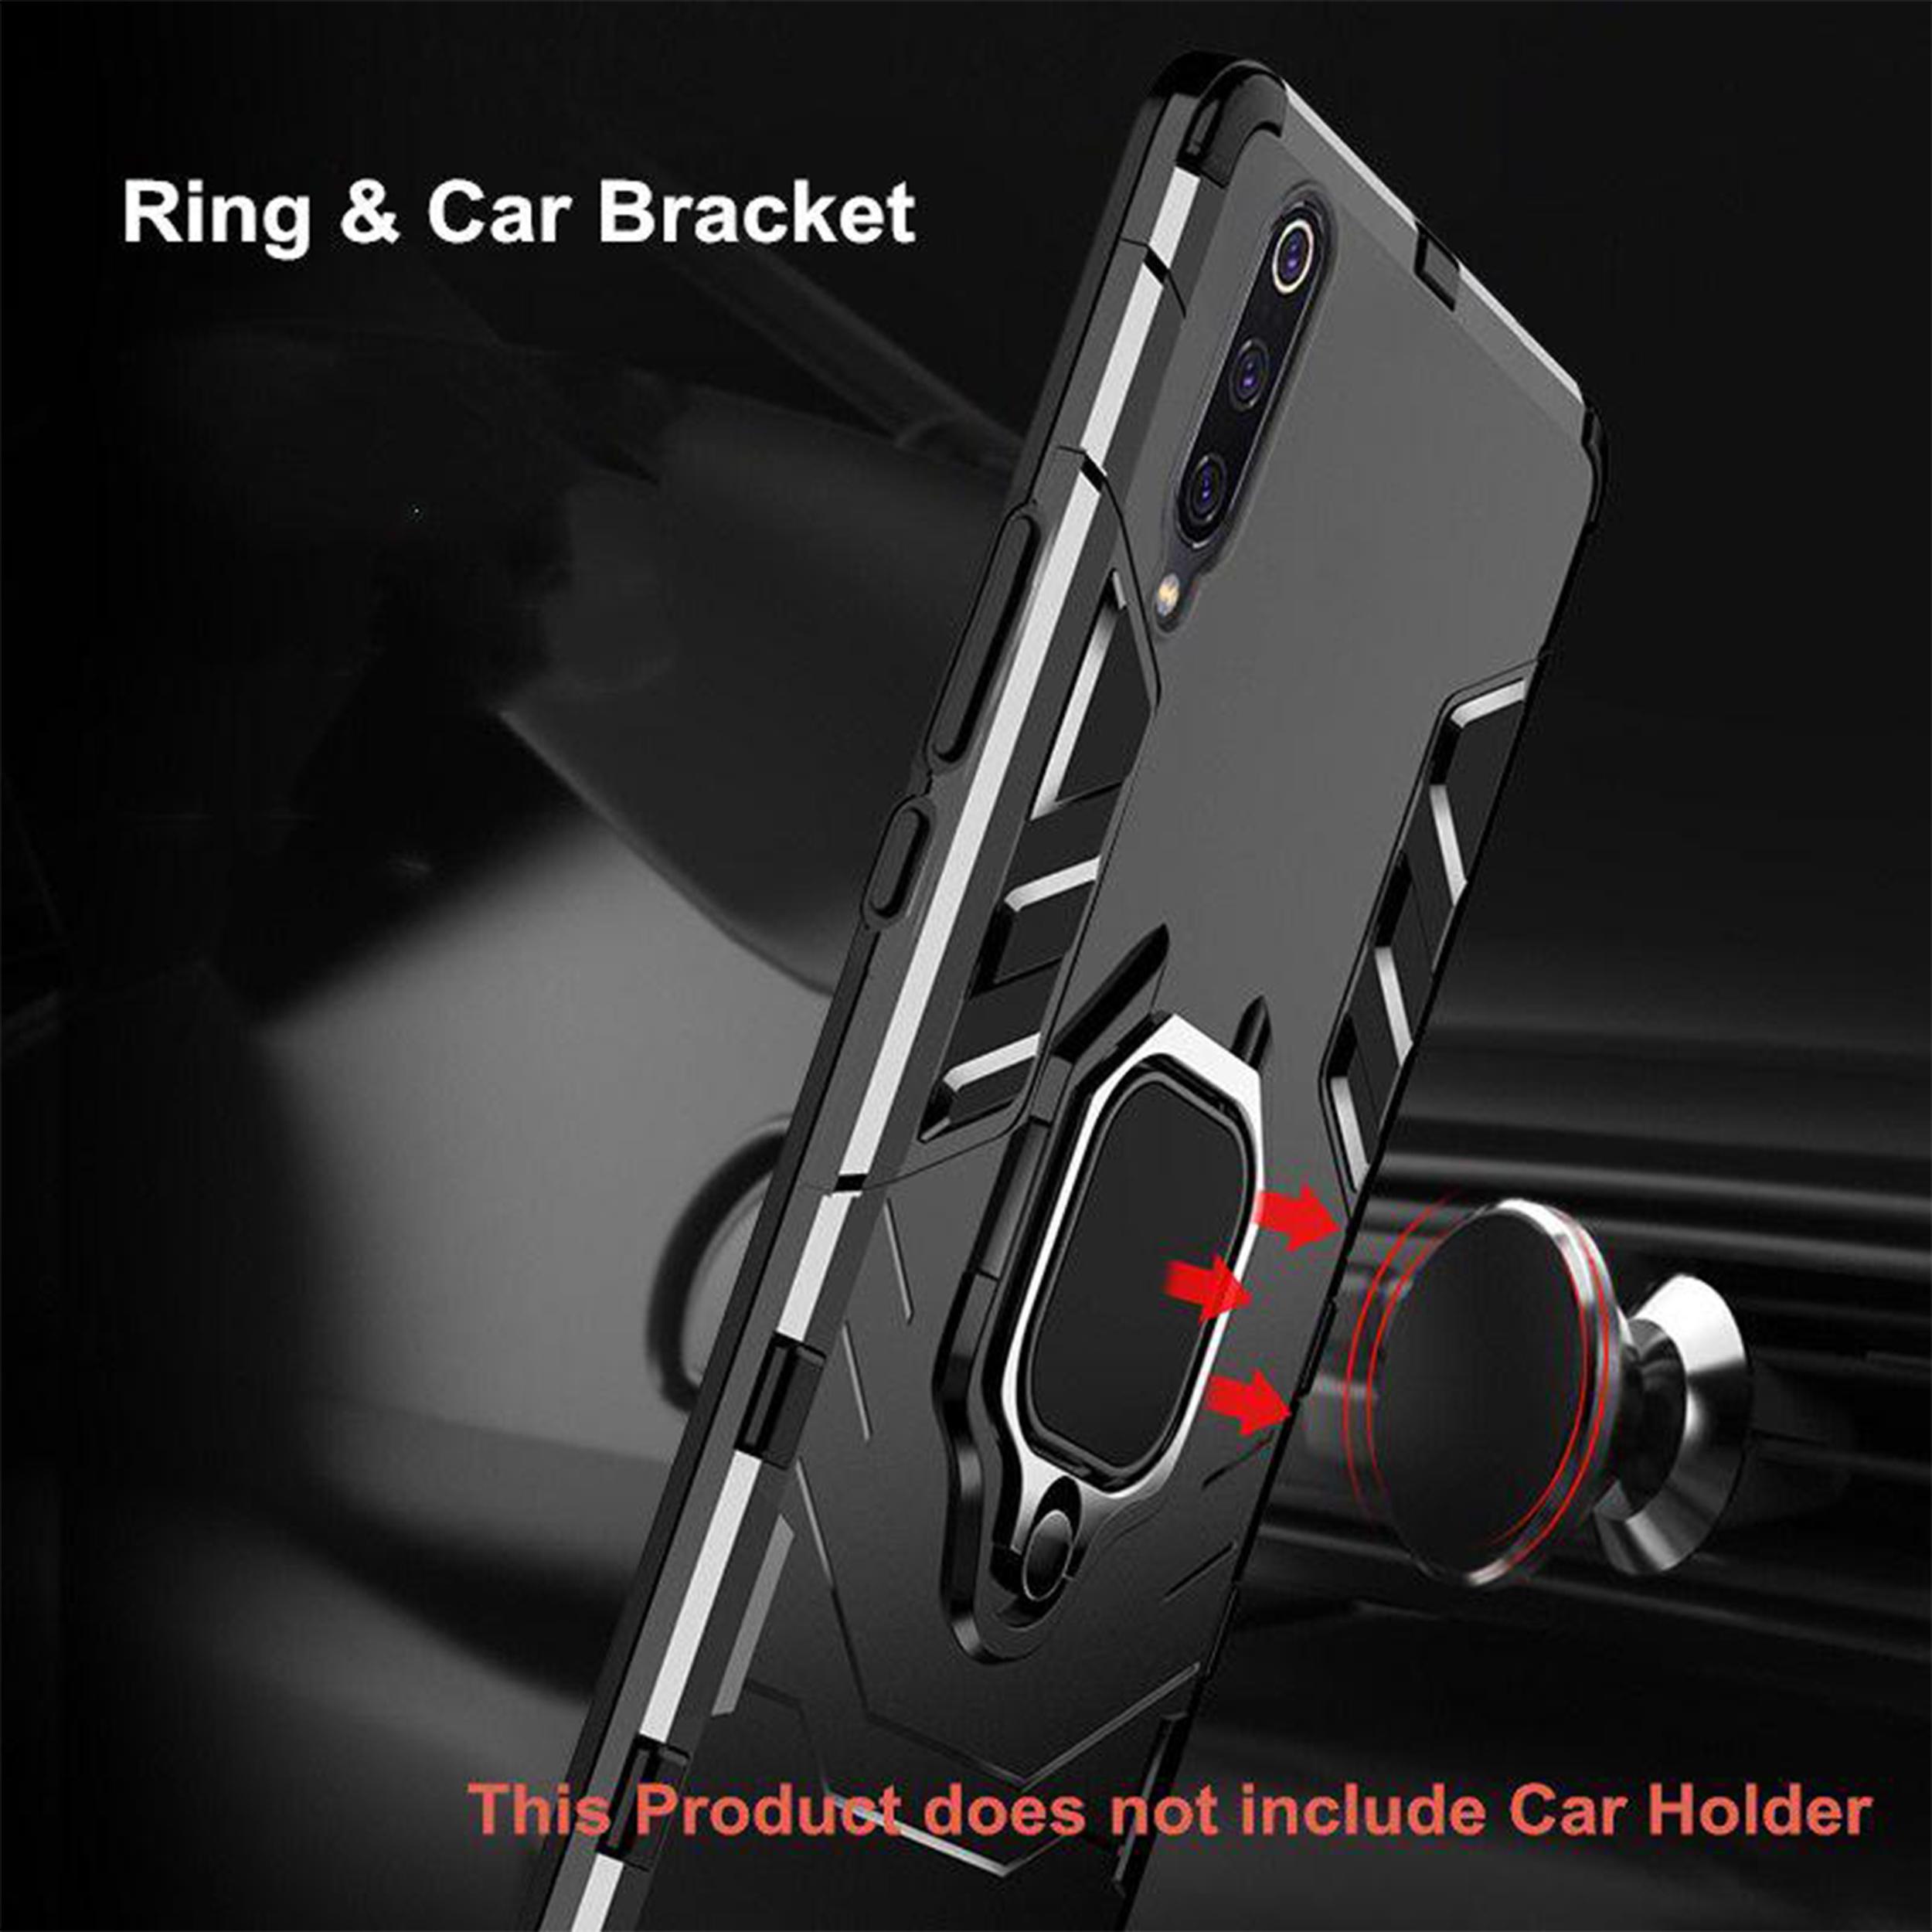 کاور کانواس مدل RHINO SERIES مناسب برای گوشی موبایل سامسونگ Galaxy A50s/A30s/A50 main 1 10